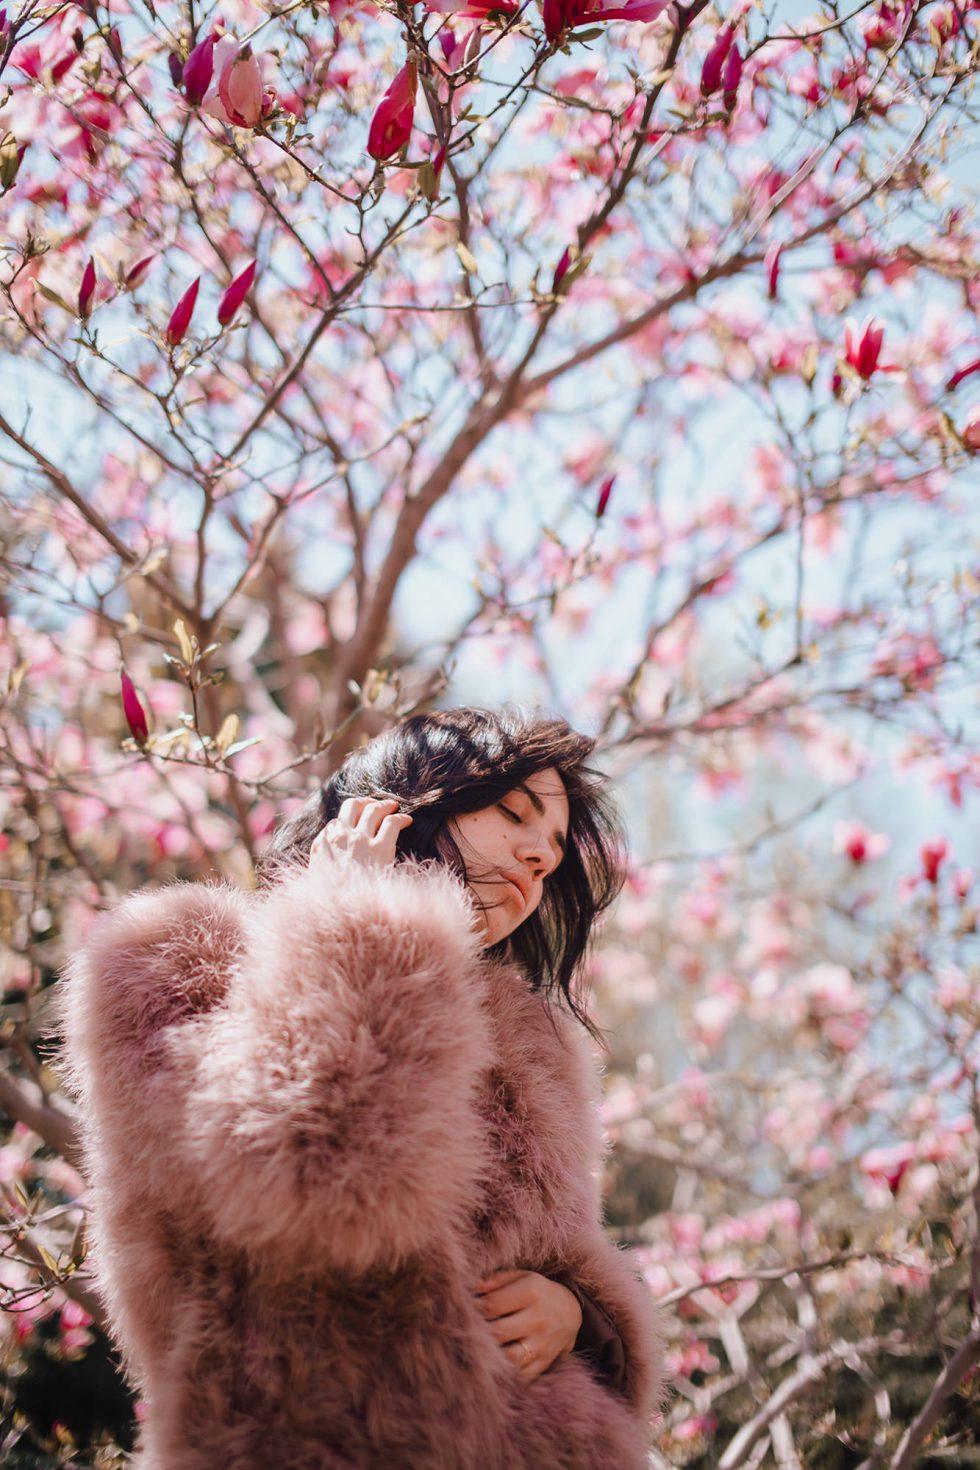 cherry-blossom-botanical-garden-jardin-botanique-montreal-lifestyle-photographer-laura-g-diaz-1